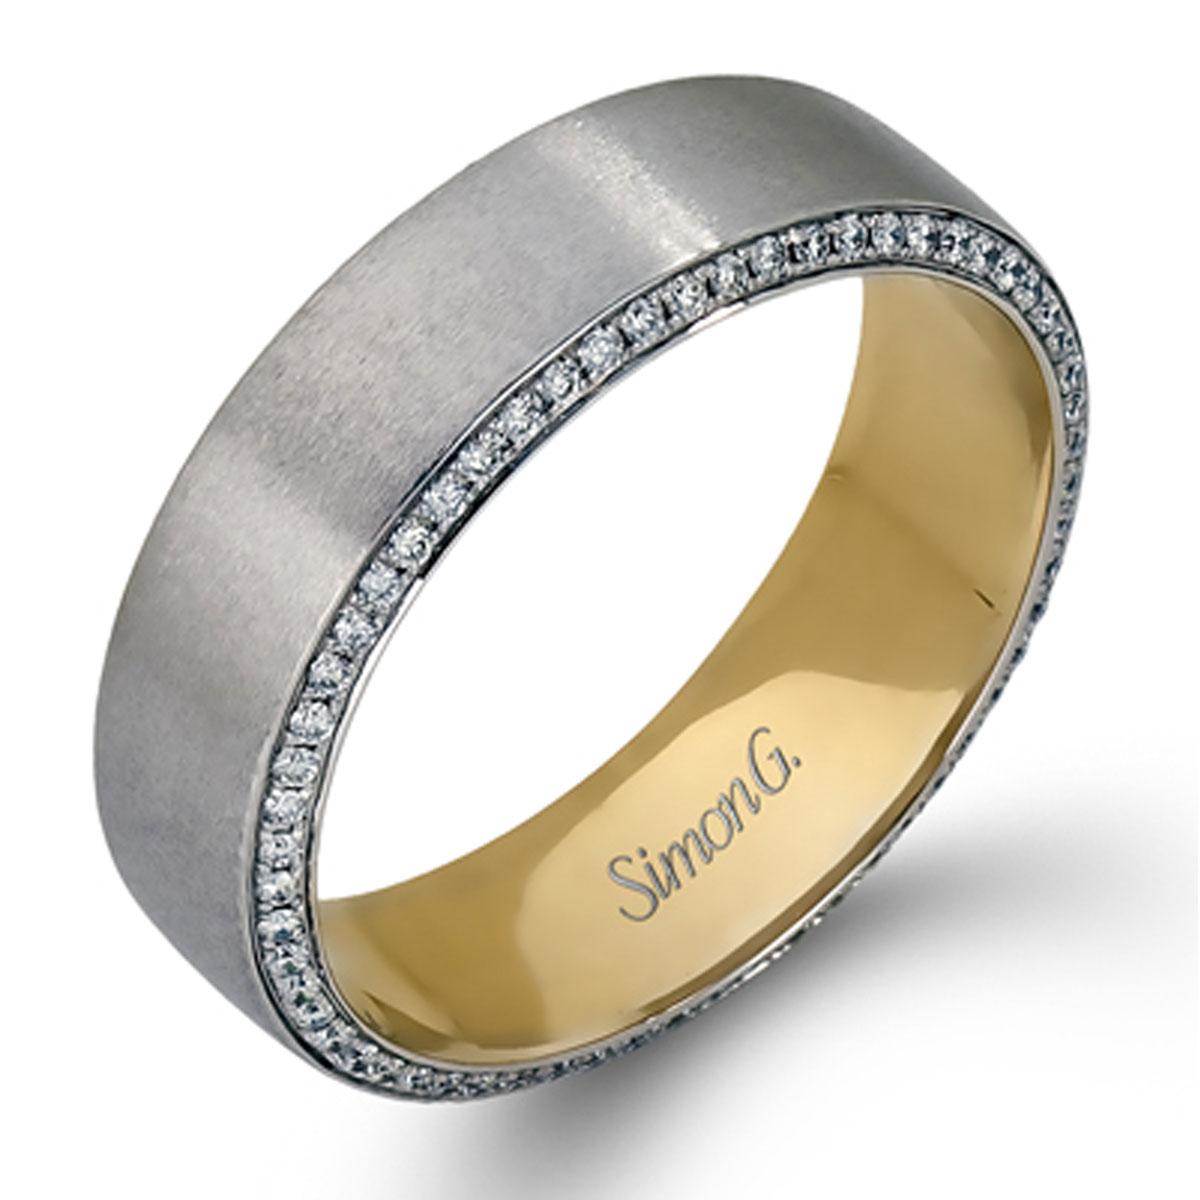 simon g engagement rings two tone men's wedding band .50ctw